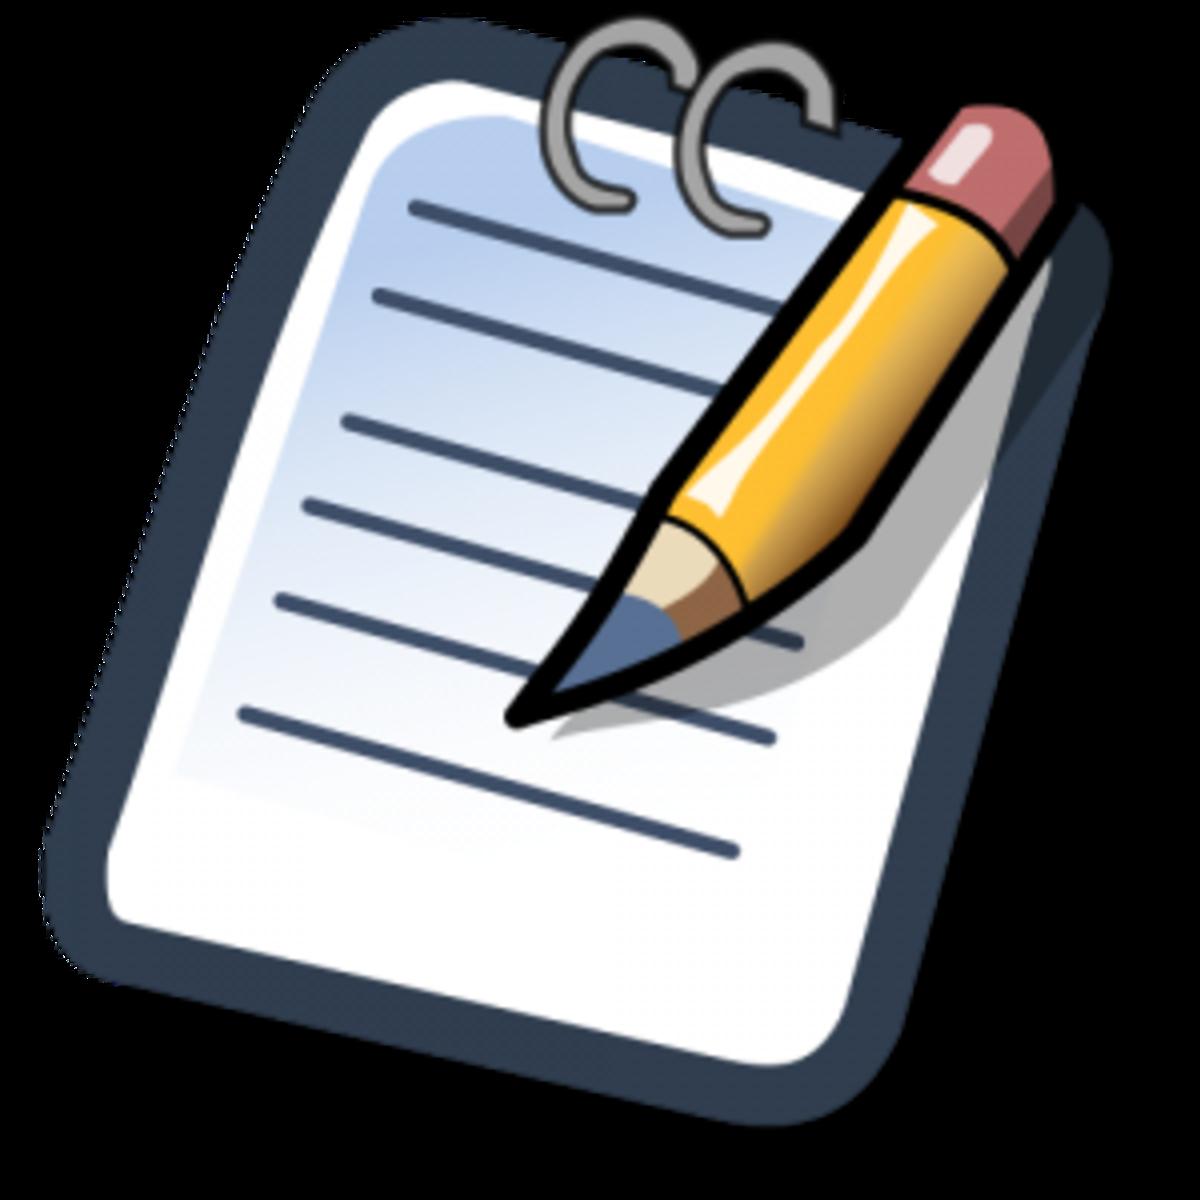 oeb-500px-Notepad_icon.svg